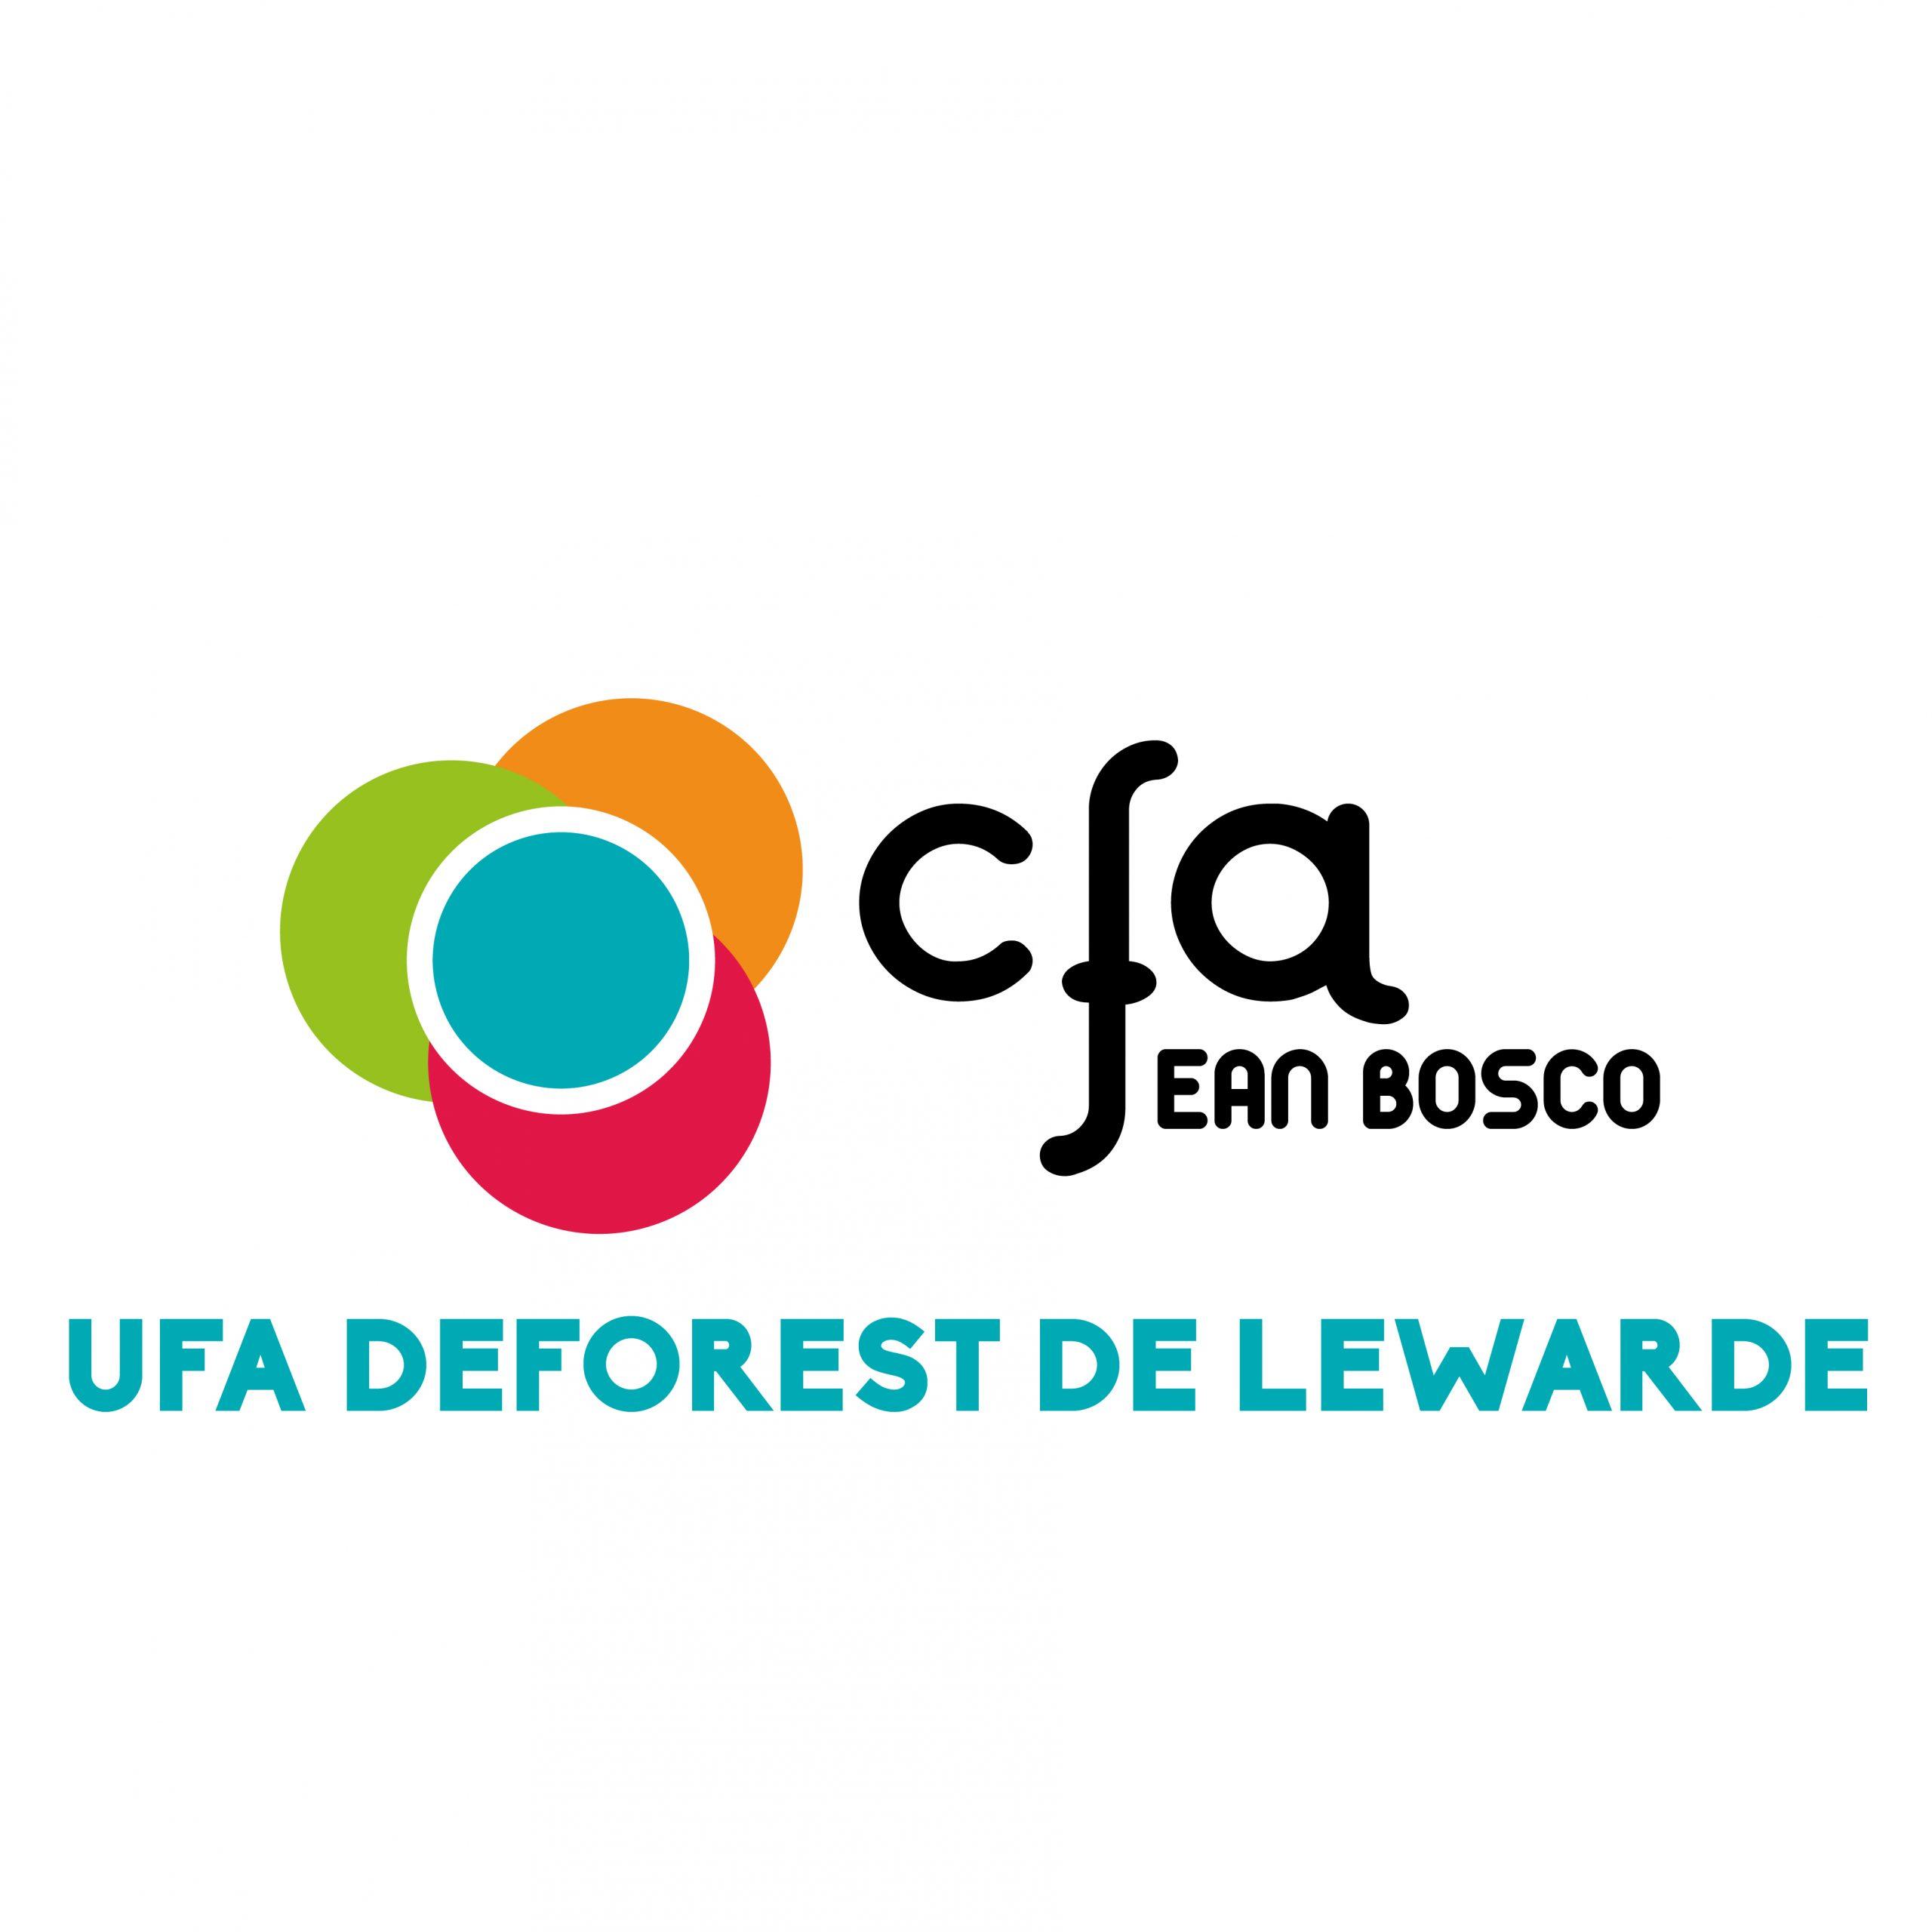 UFA DEFOREST DE LEWARDE